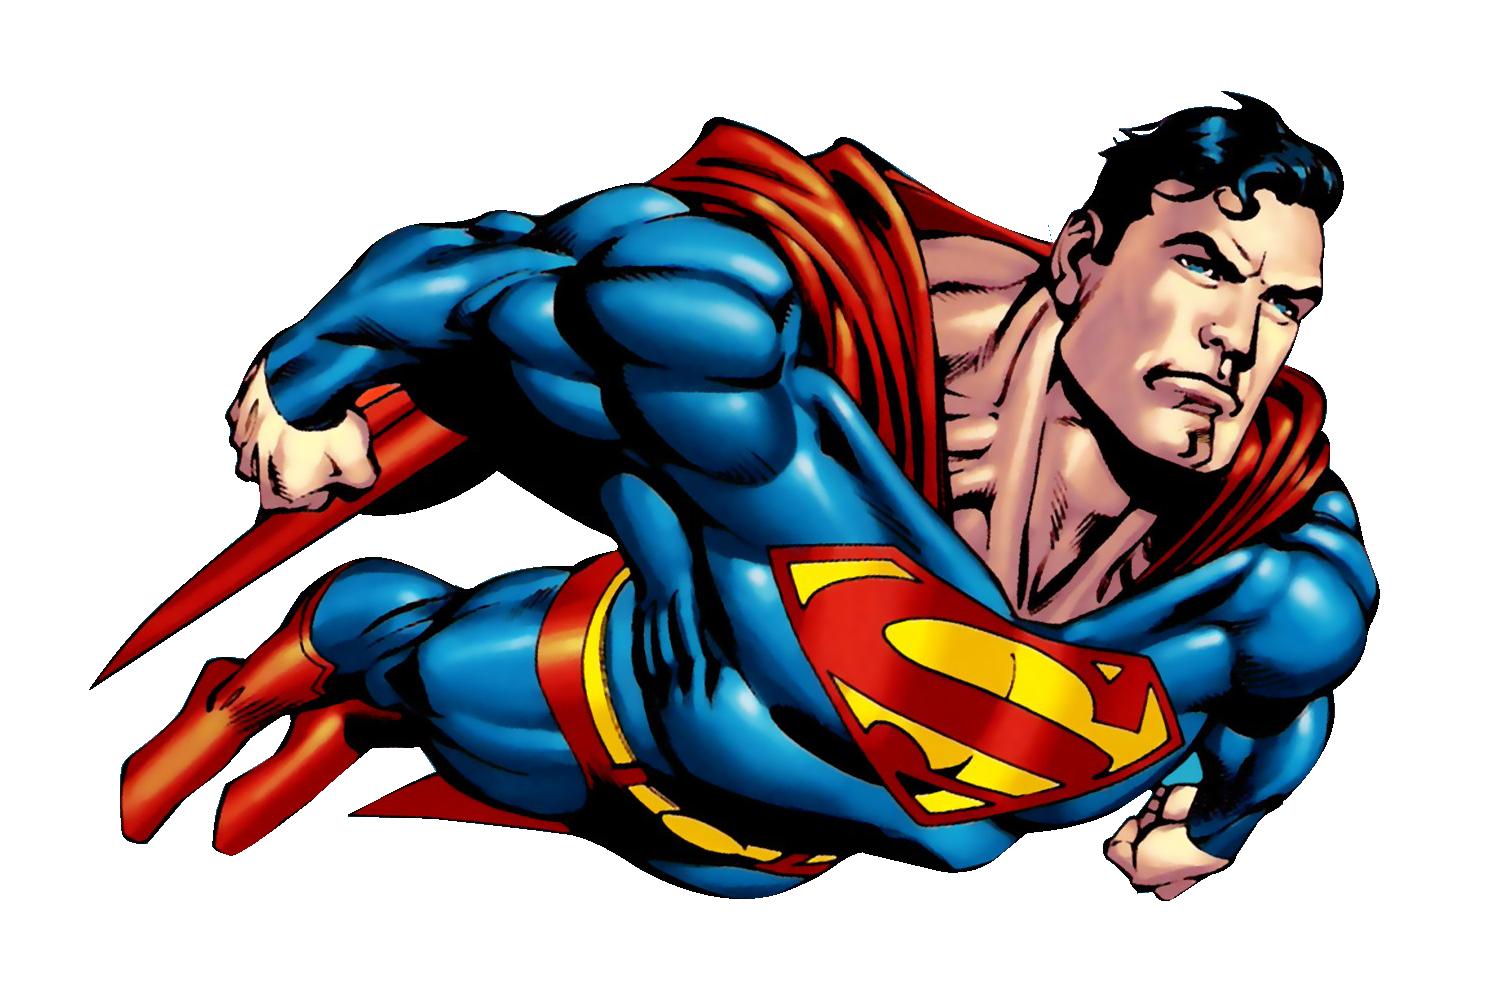 Superman PNG Image - PurePNG | Free transparent CC0 PNG ...